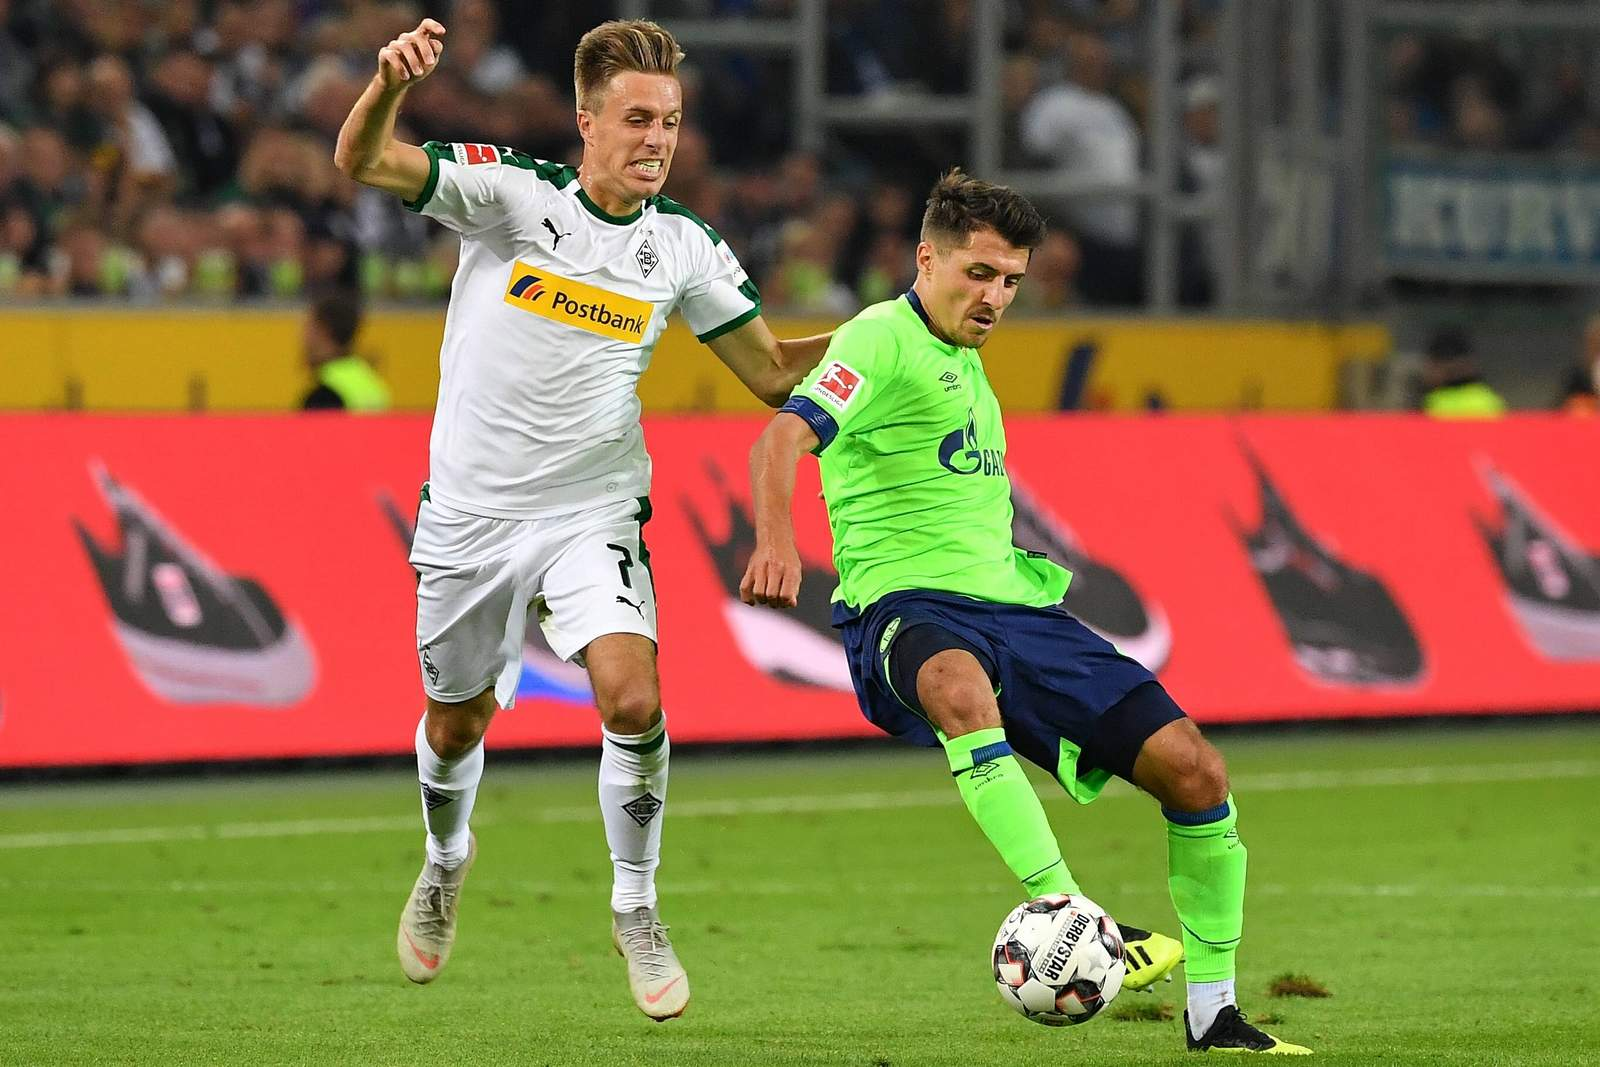 xuhx Moenchengladbach Borussia Park 15 09 18 1 Bundesliga 3 Spieltag Borussia Moenchengladbach